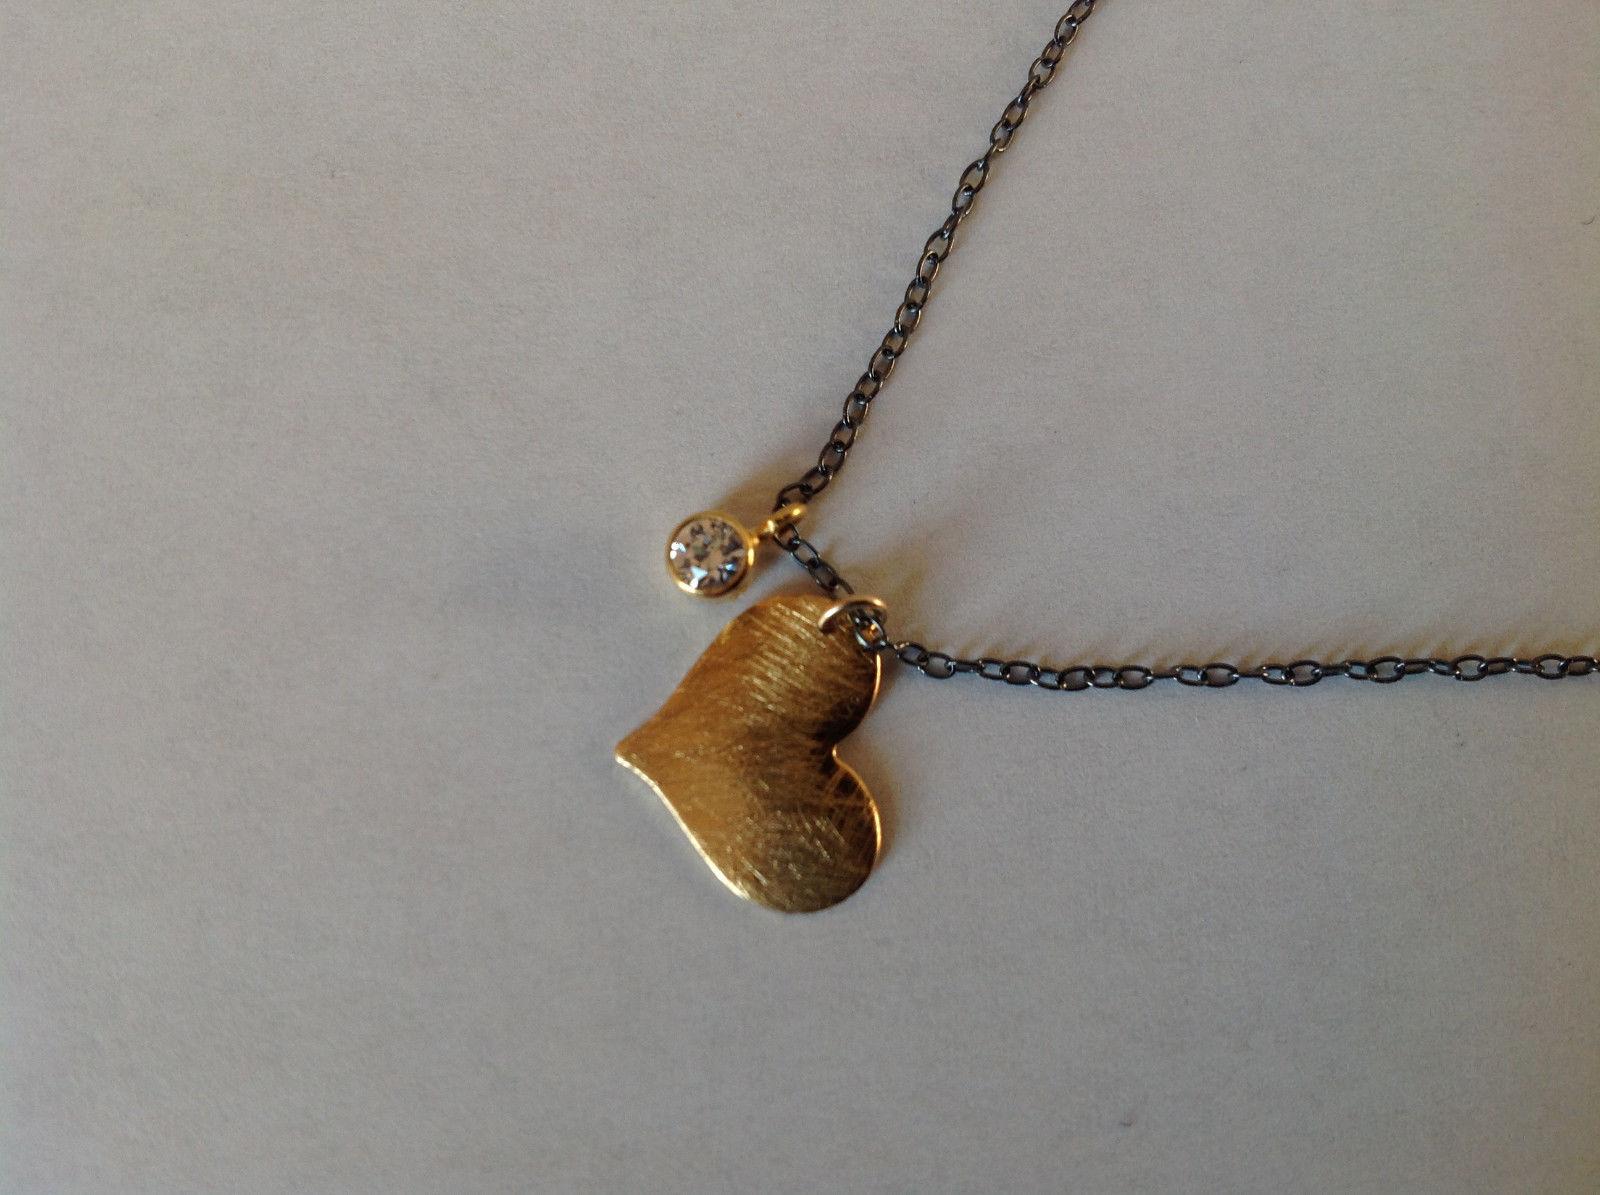 Handmade Zina Kao Flat Heart w CZ Bezel set Charm Necklace Gold w Black Chain